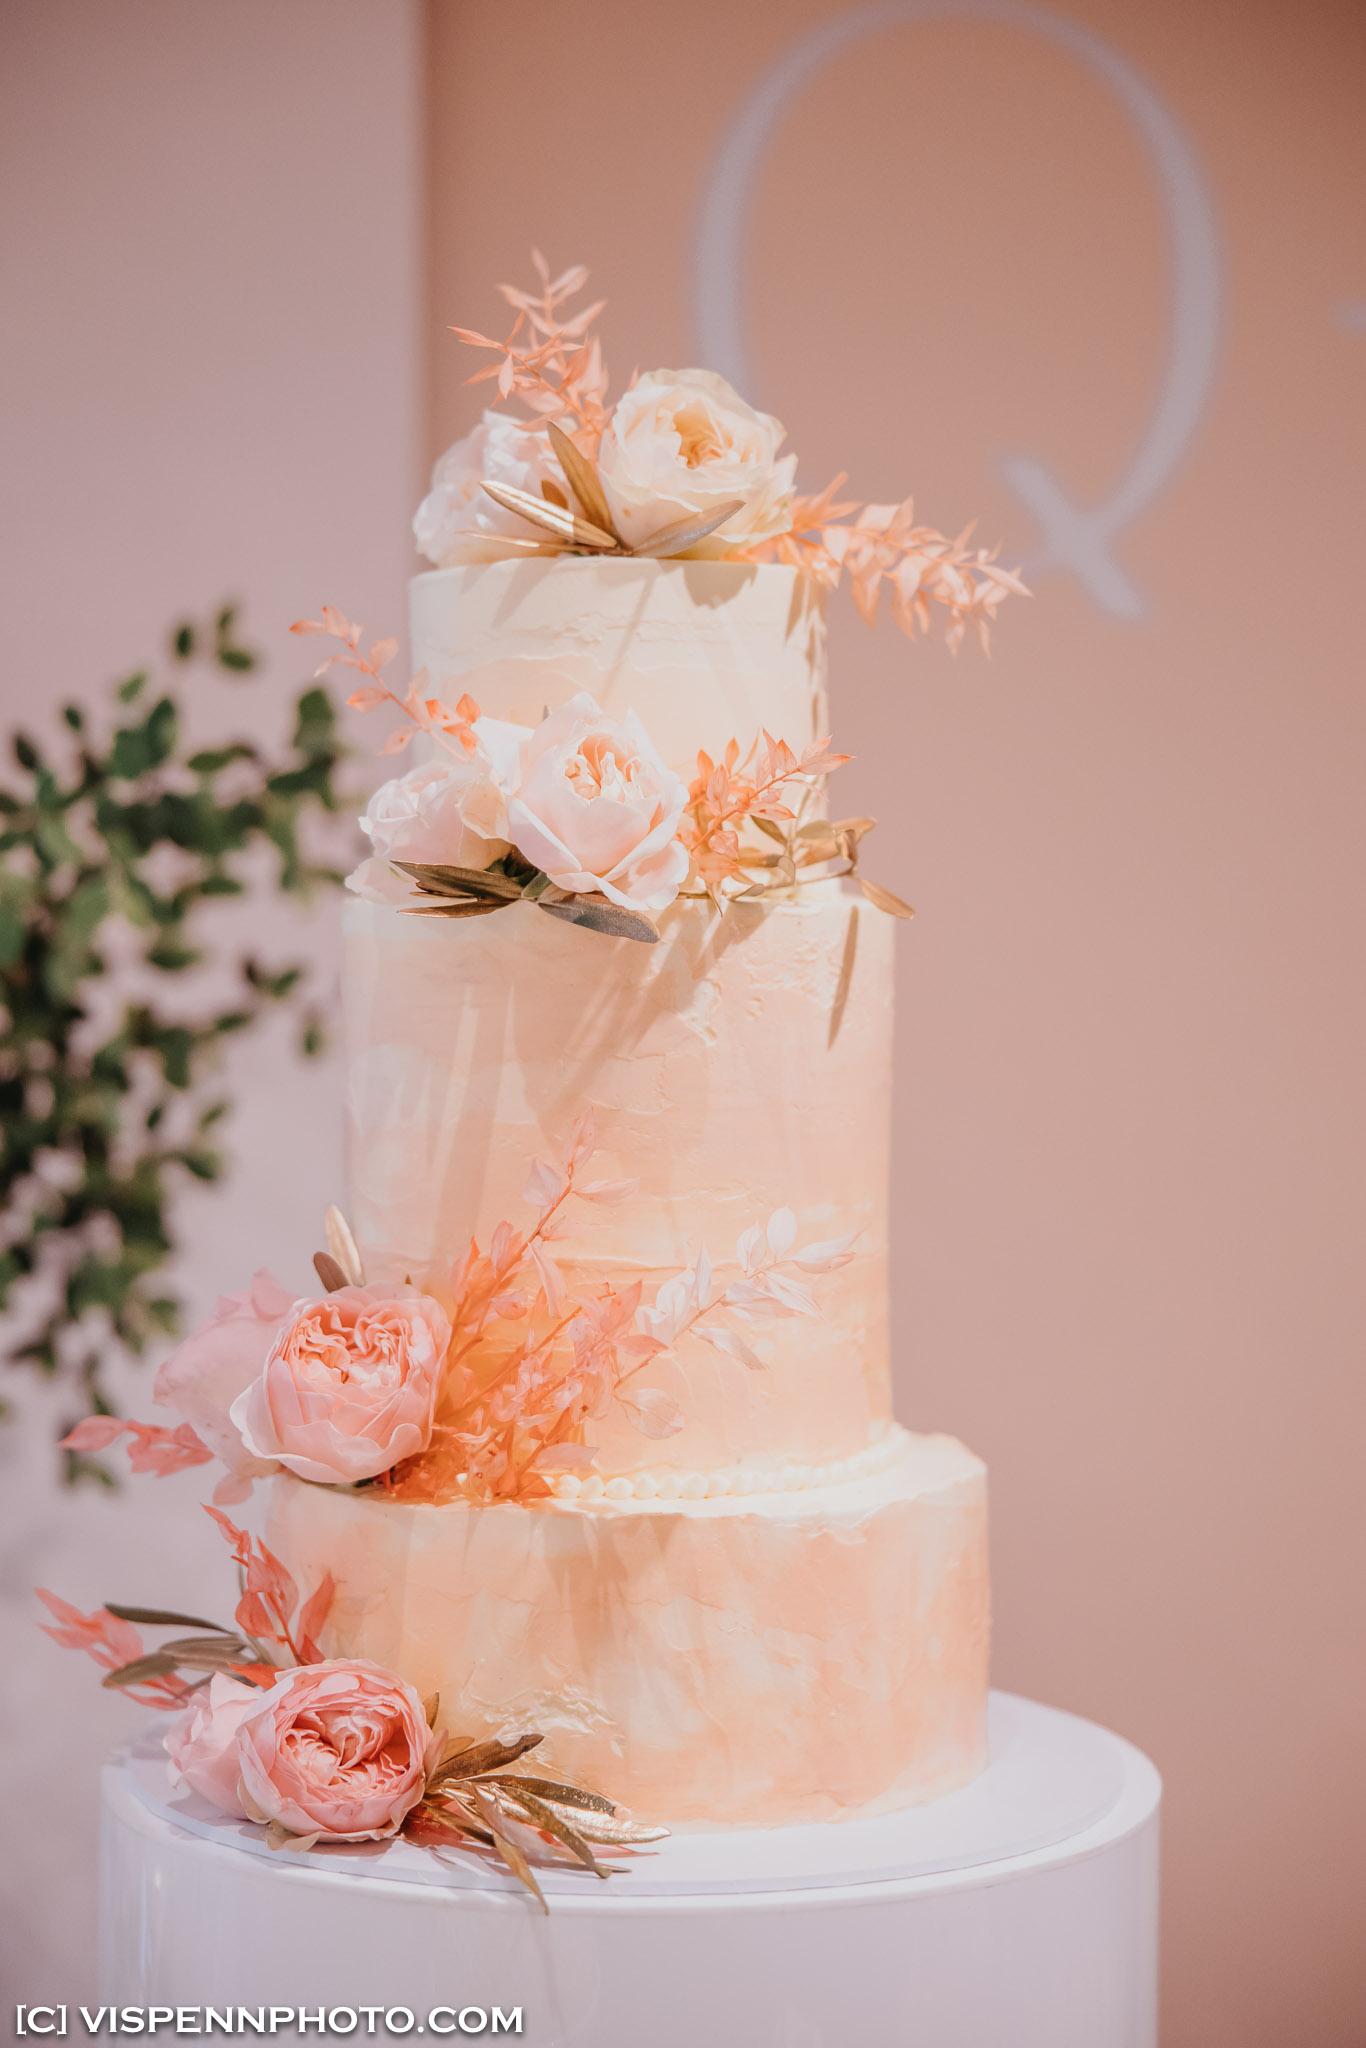 WEDDING DAY Photography Melbourne ElitaPB 09855 1P EOSR ZHPENN